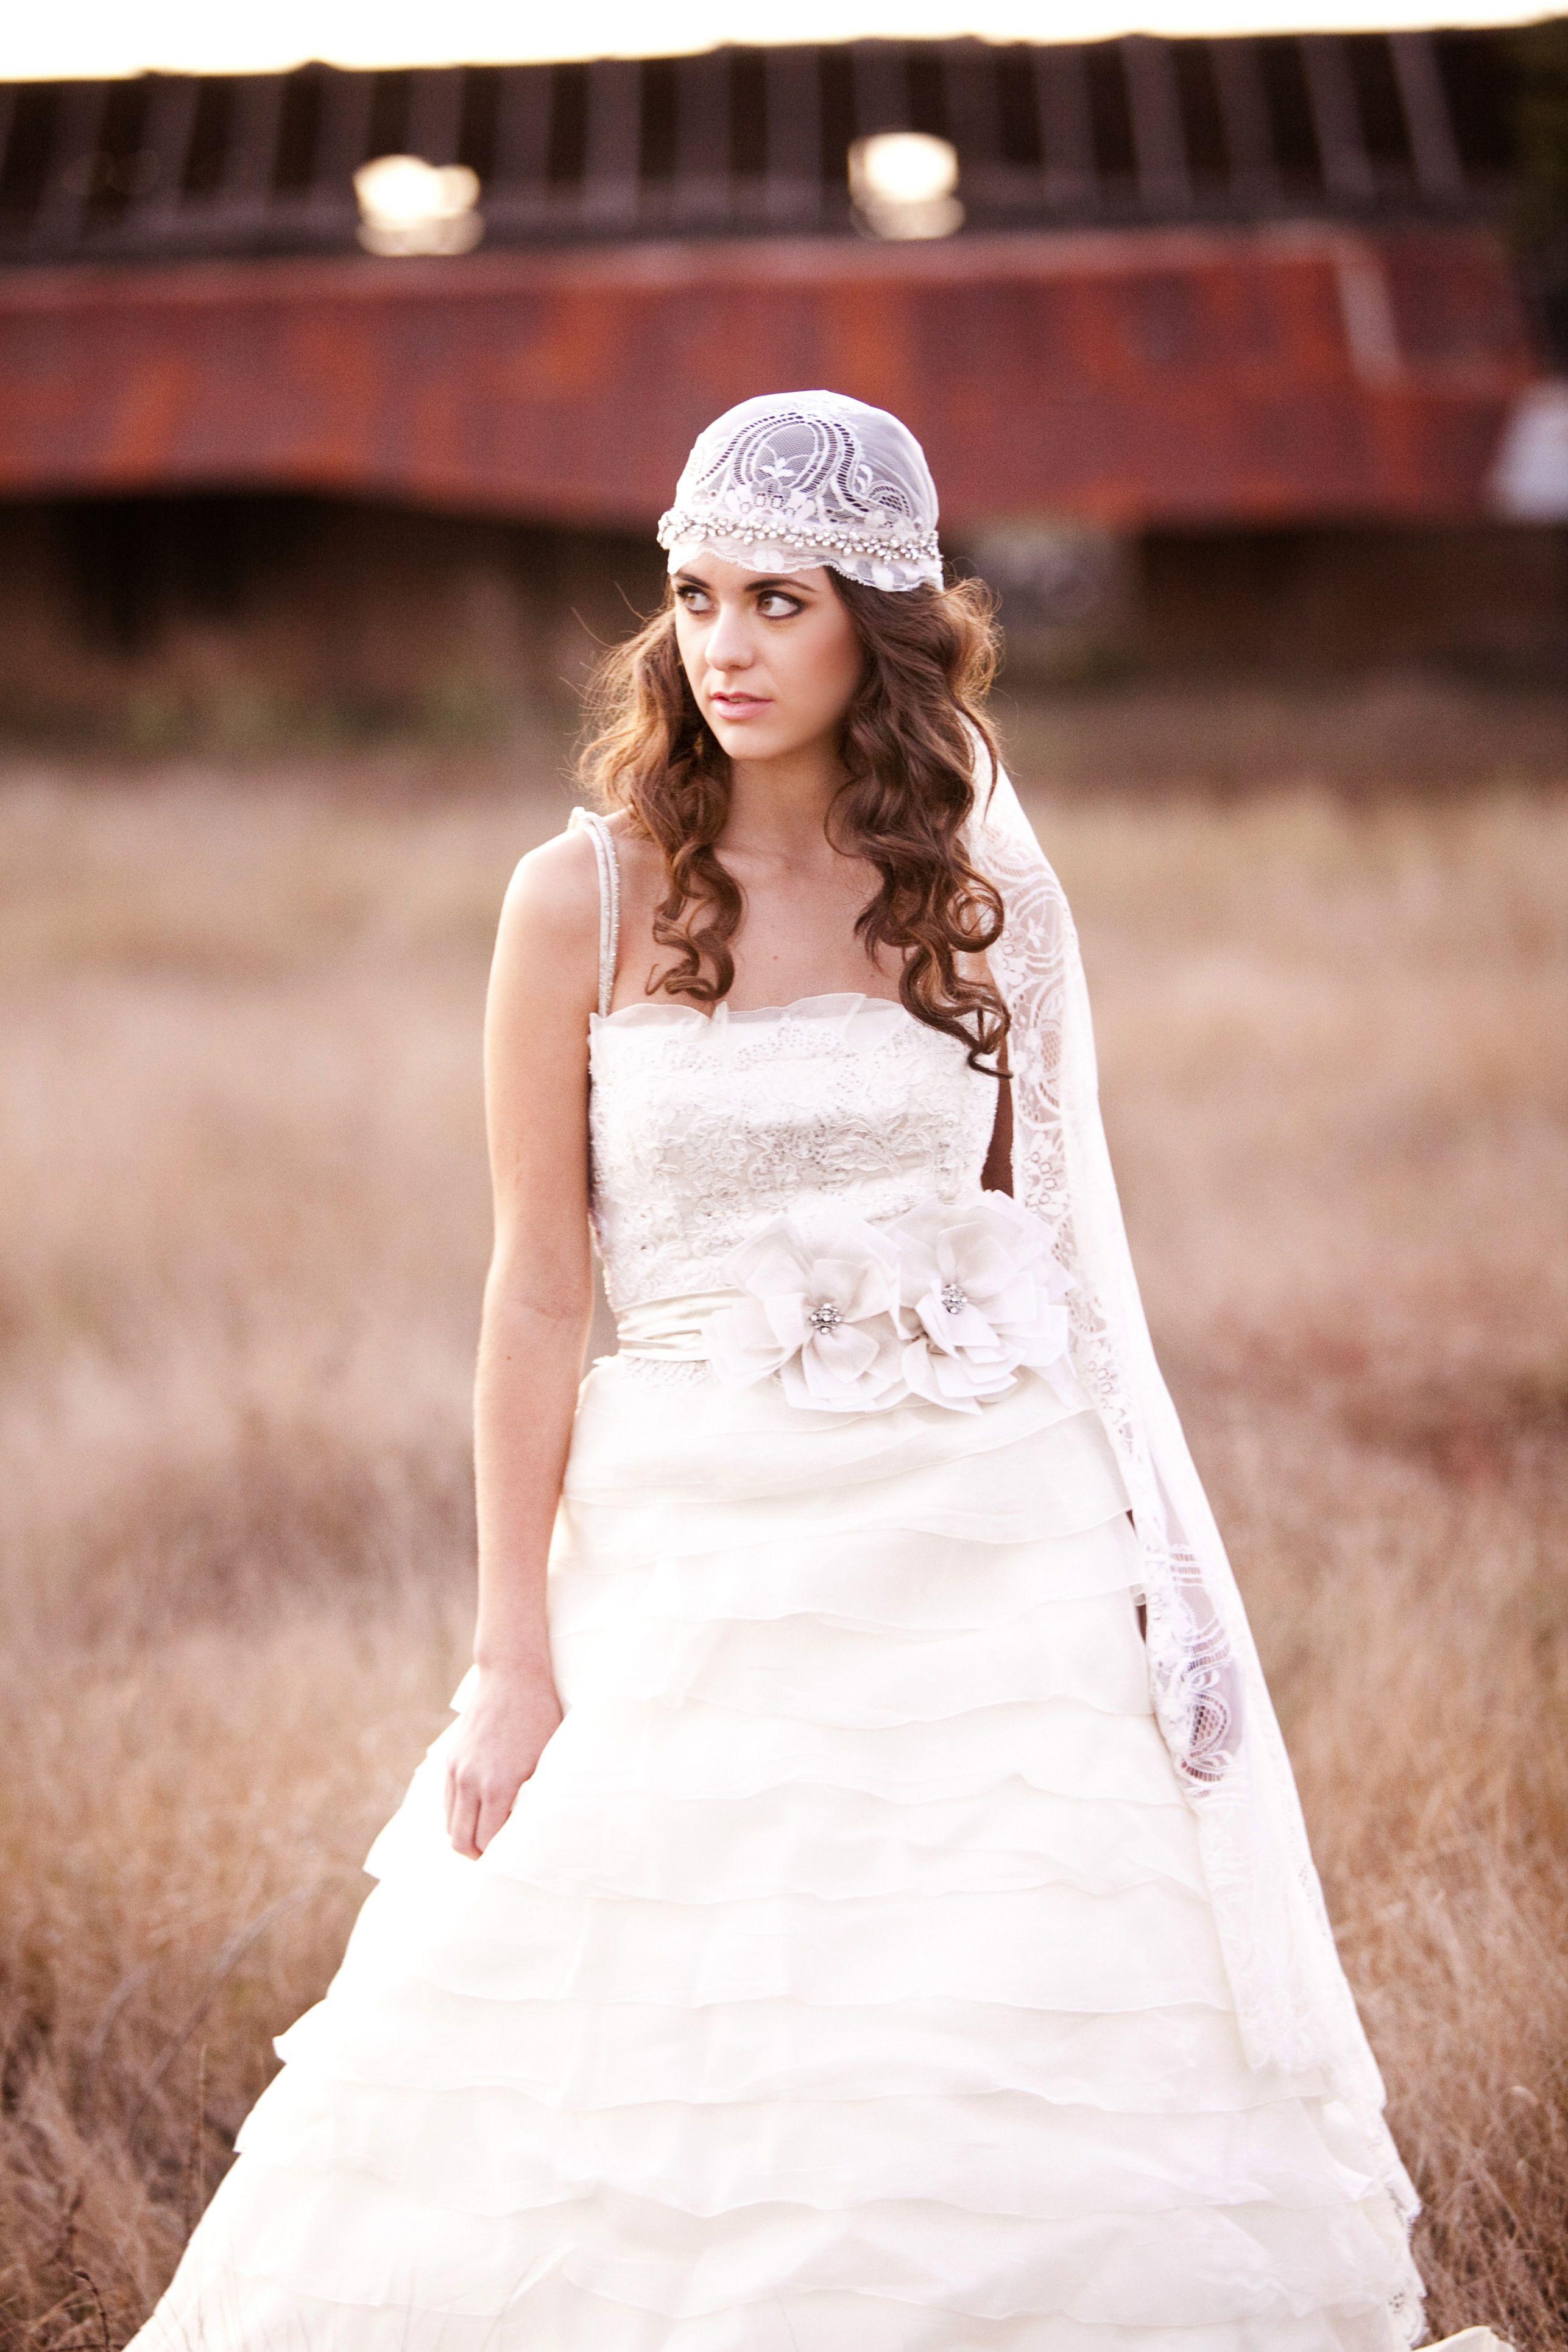 e4cbe60518 velos de novia estilo pirata